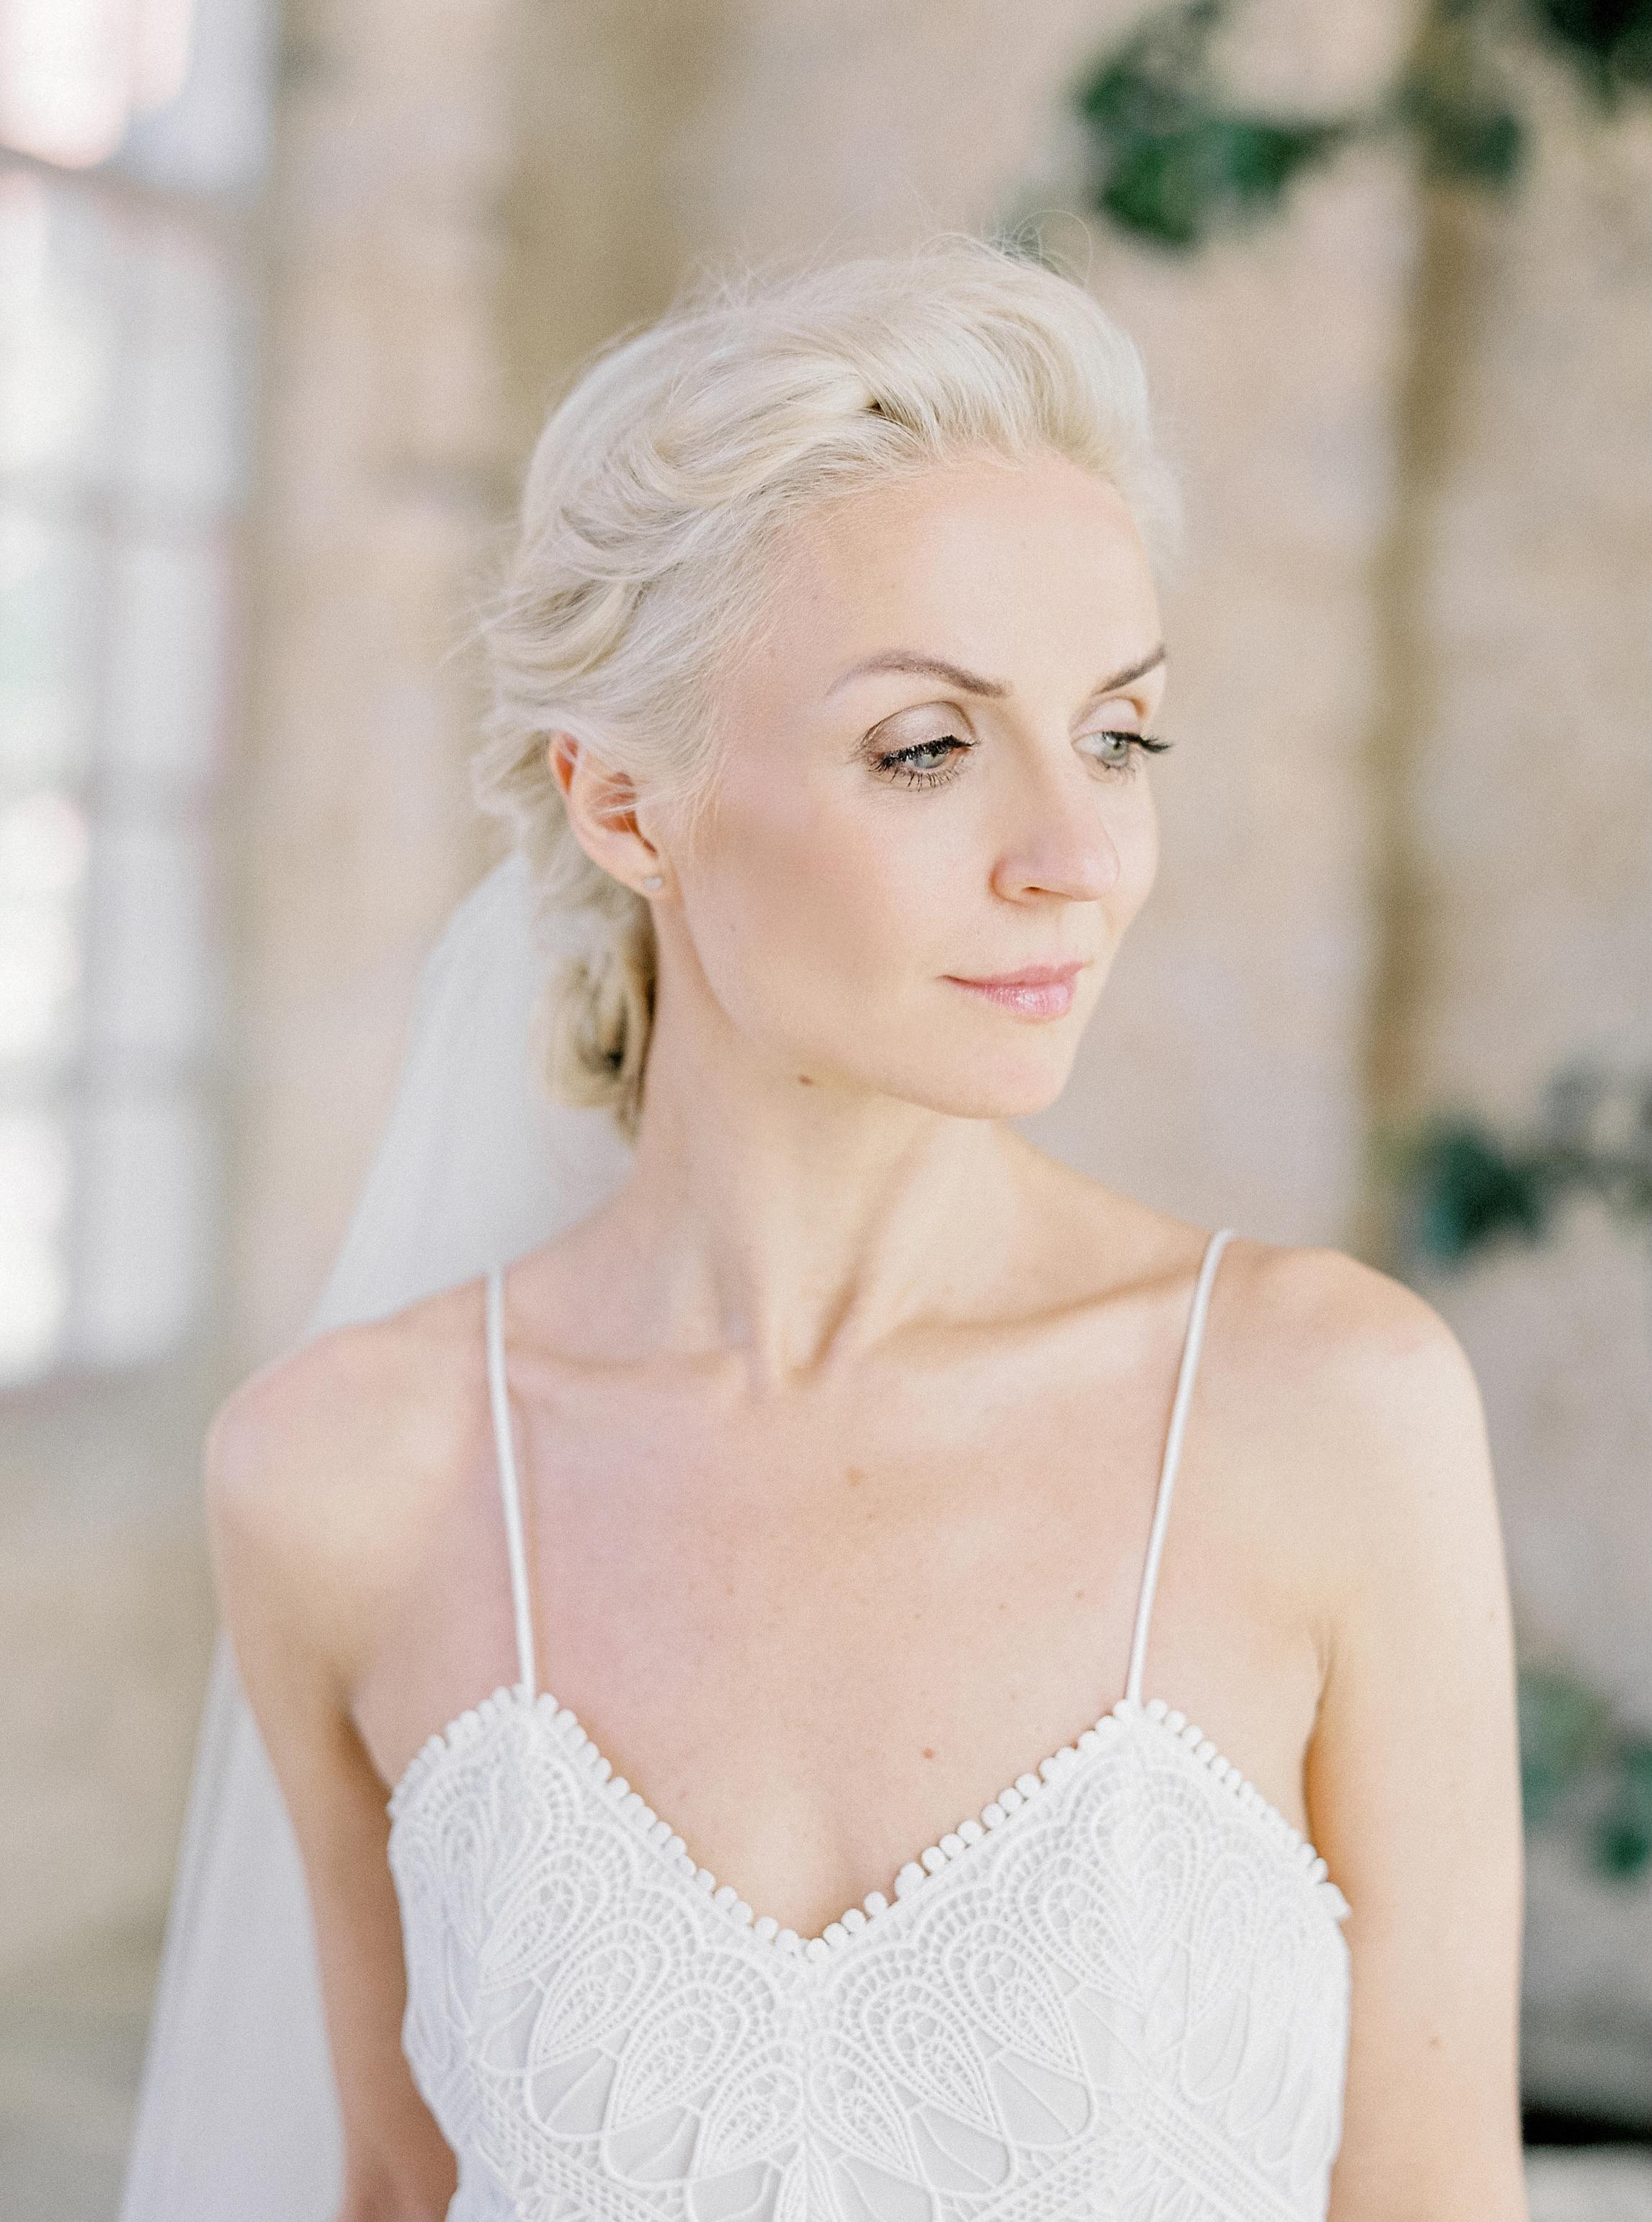 Nastia_Vesna_Photography_Wedding_Portugal_25.jpg